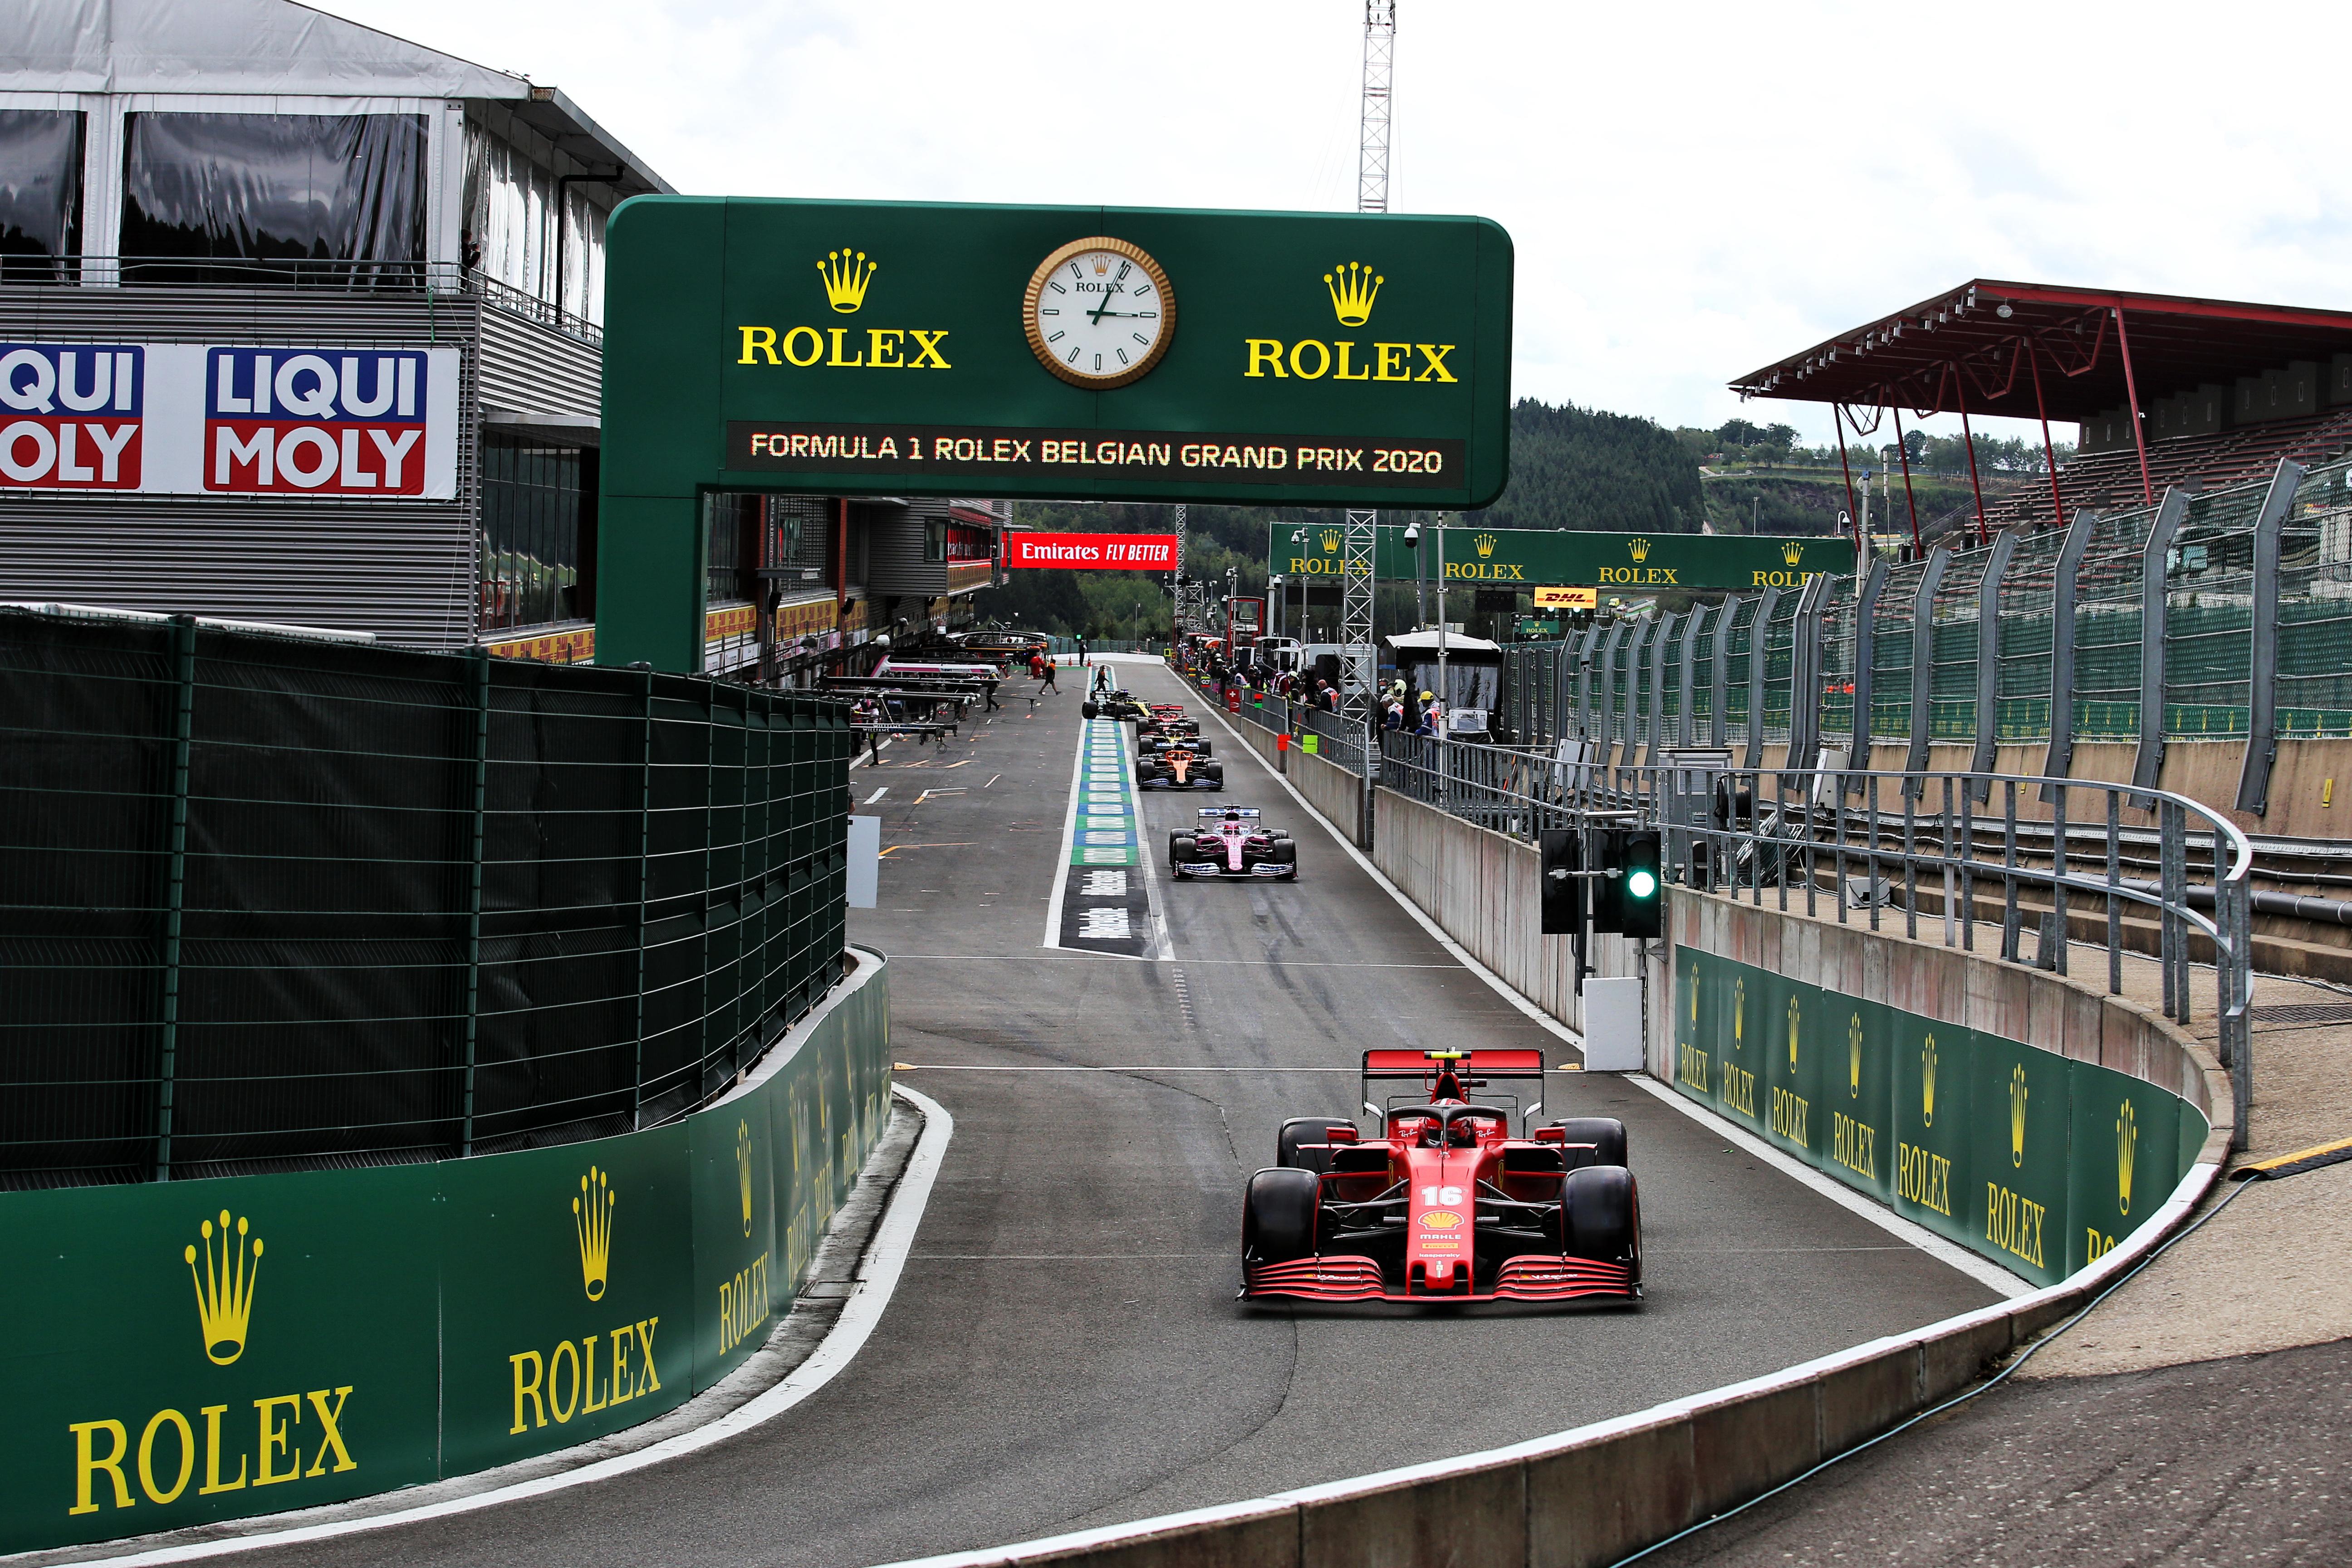 Motor Racing Formula One World Championship Belgian Grand Prix Qualifying Day Spa Francorchamps, Belgium